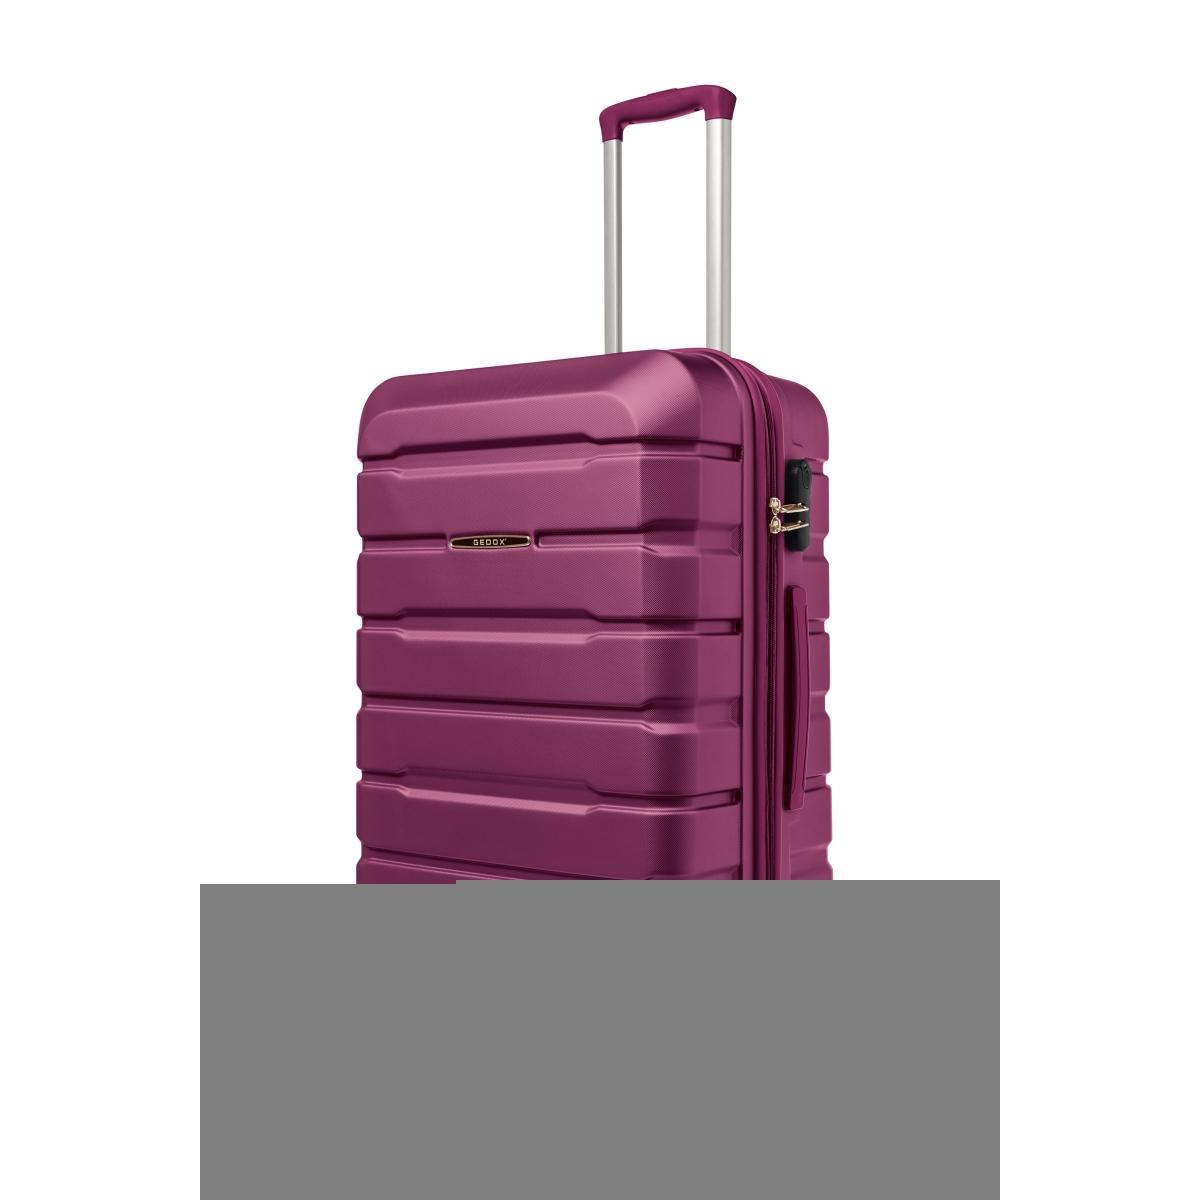 Gedox Abs Premium Tonaton 3'lü Valiz Seyahat Seti - Model:500.09 Mürdüm